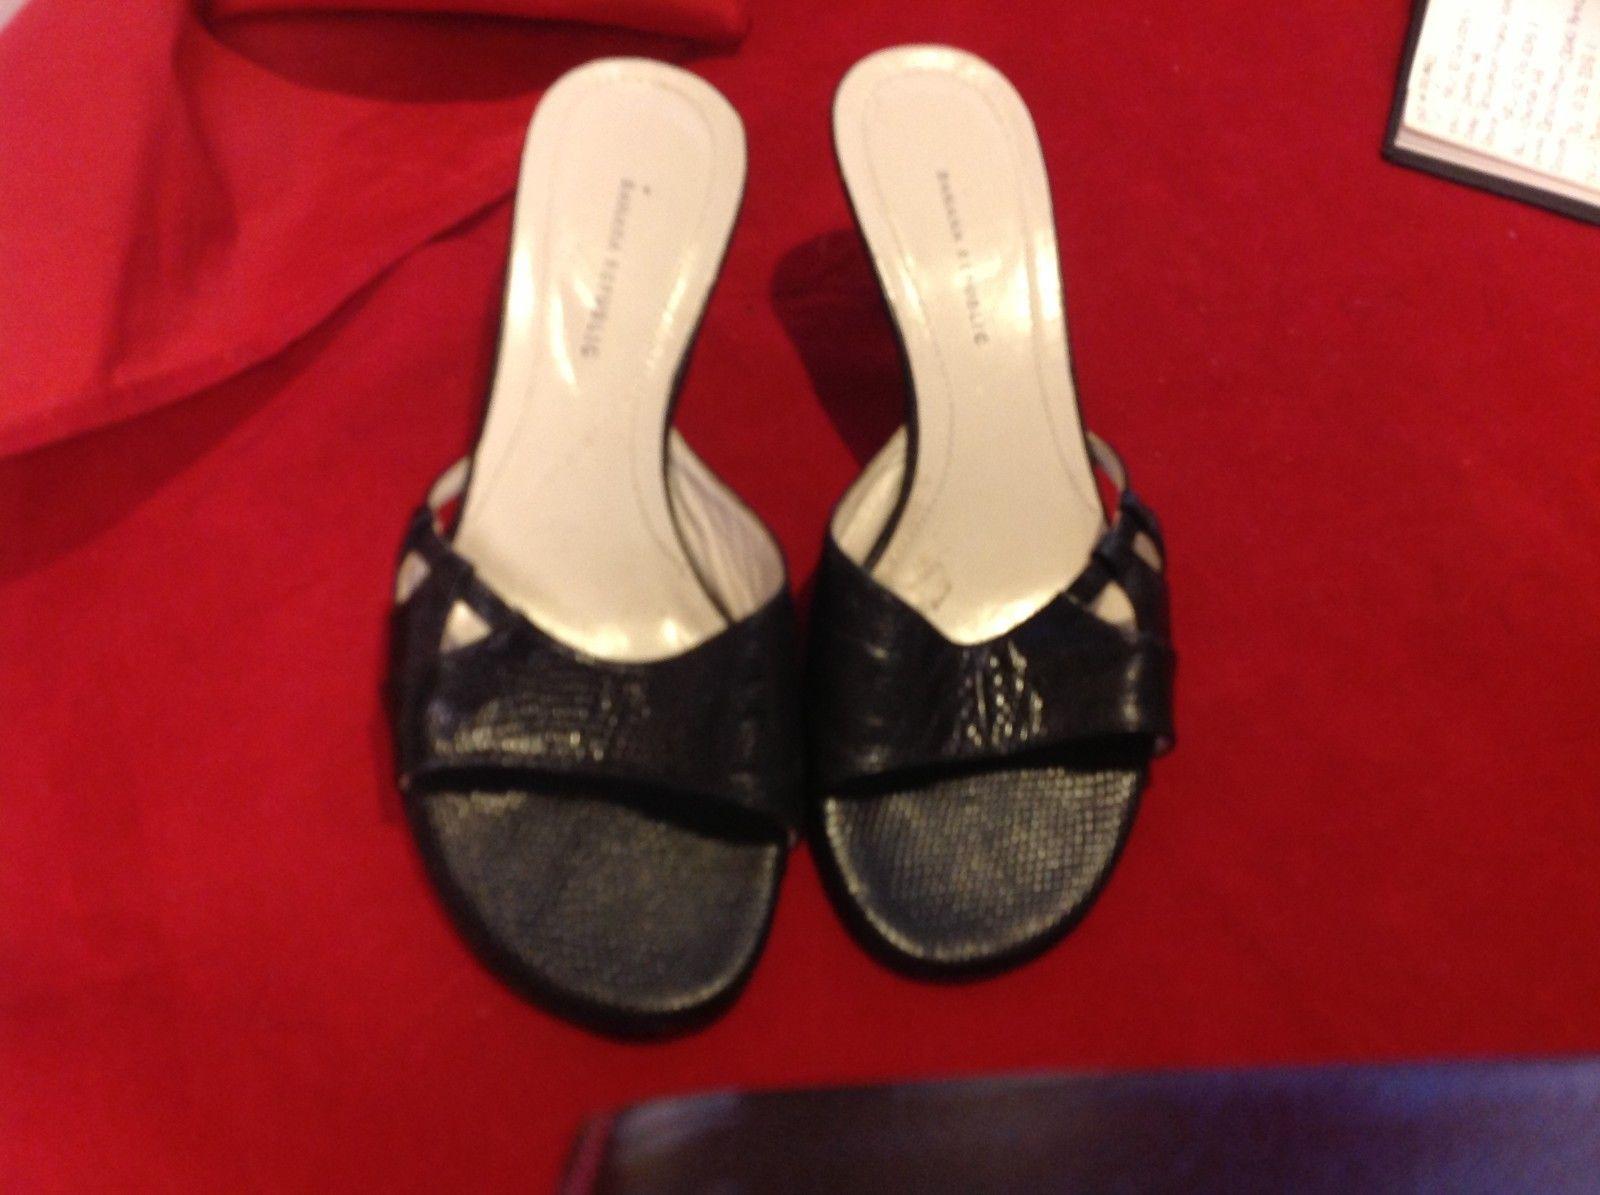 banana republic black 3 inch heels size 5 1/2